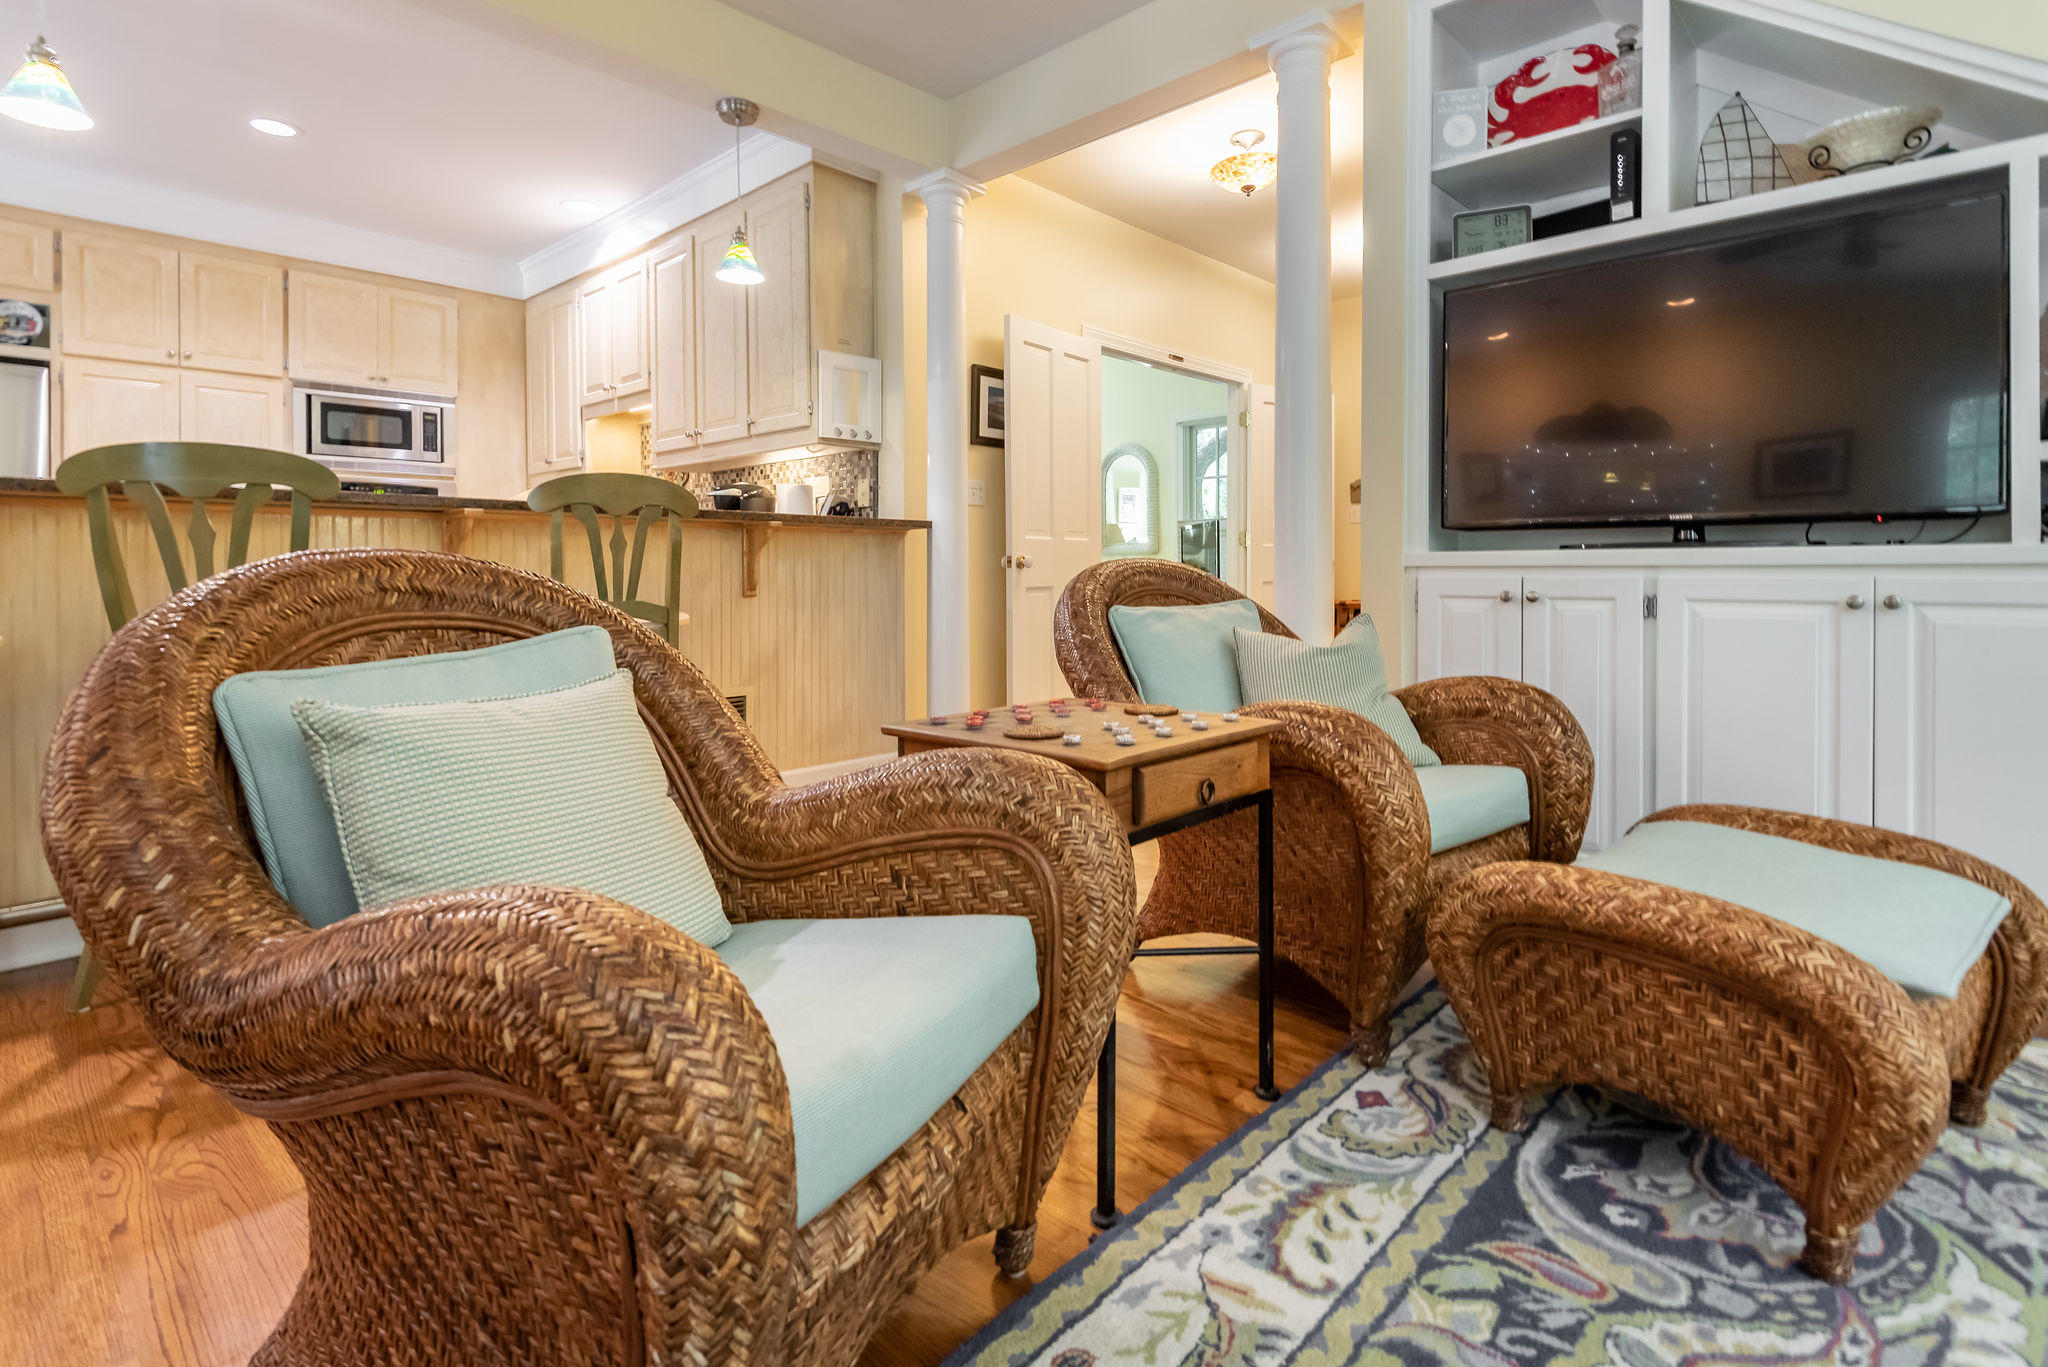 Kiawah Island Homes For Sale - 134 Conifer, Kiawah Island, SC - 13